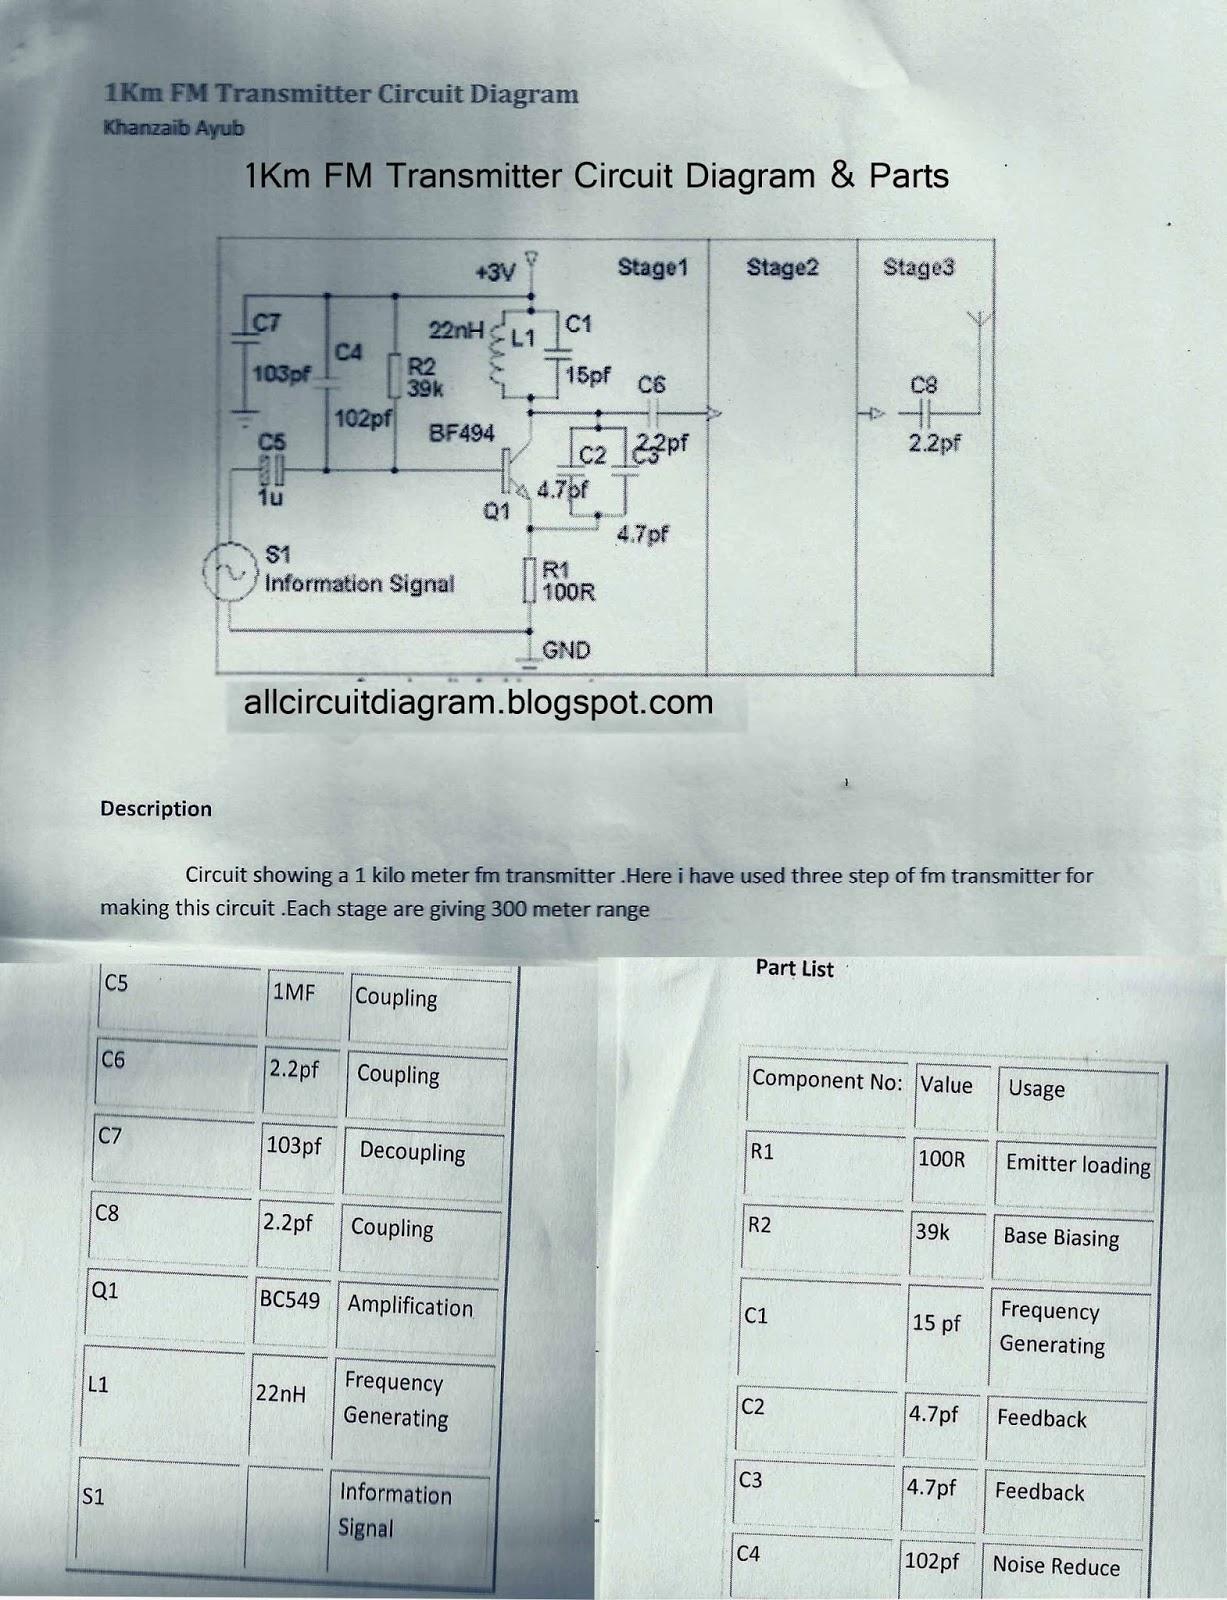 750m Fm Transmitter Circuit Diagram Bfy 50 Gallery Of Electronic Solar 1km